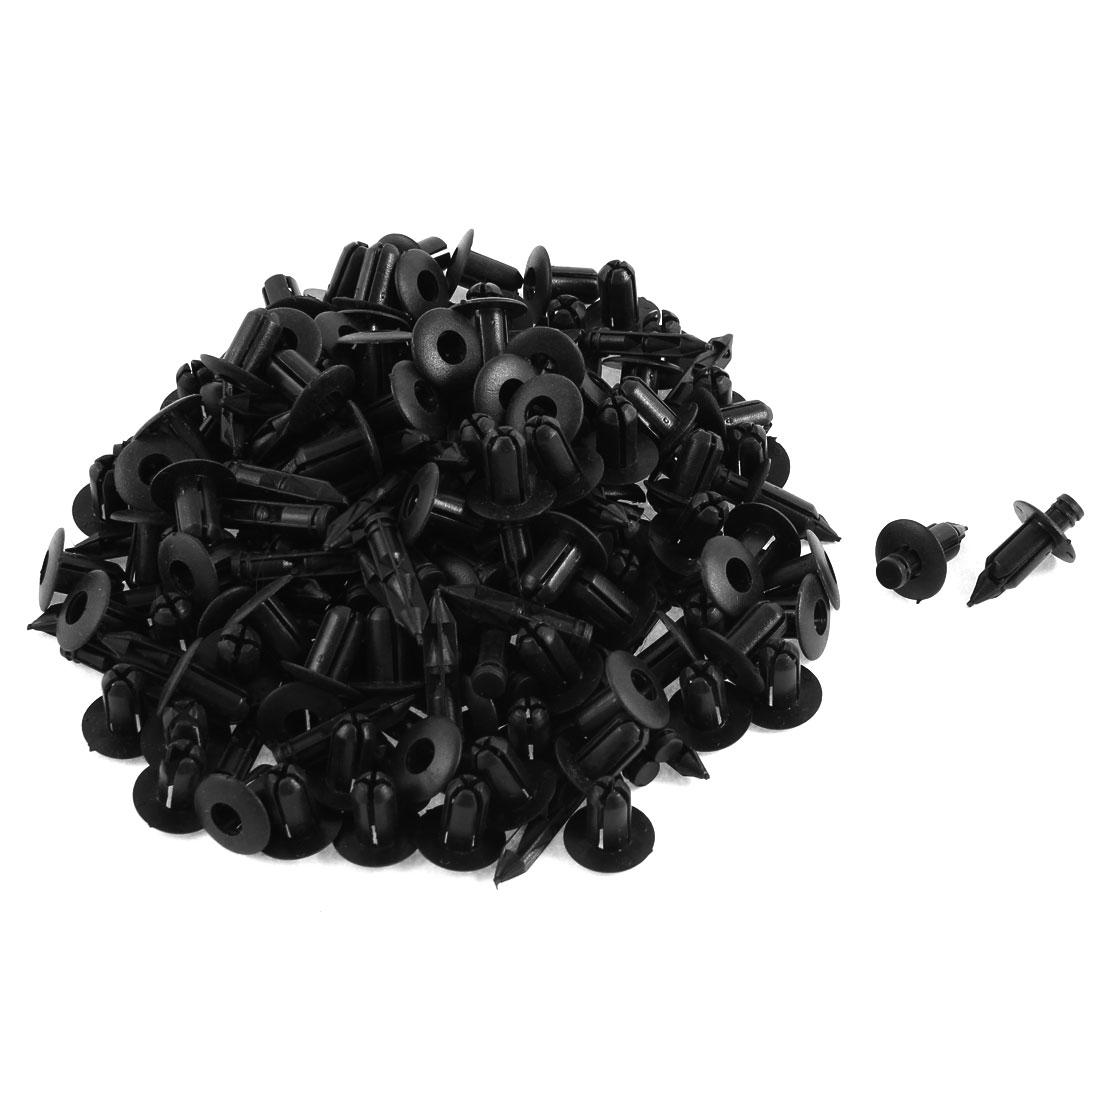 100 Pcs Black Plastic Rivet Trim Fastener Retainer Clips 6mm x 14mm x 16mm